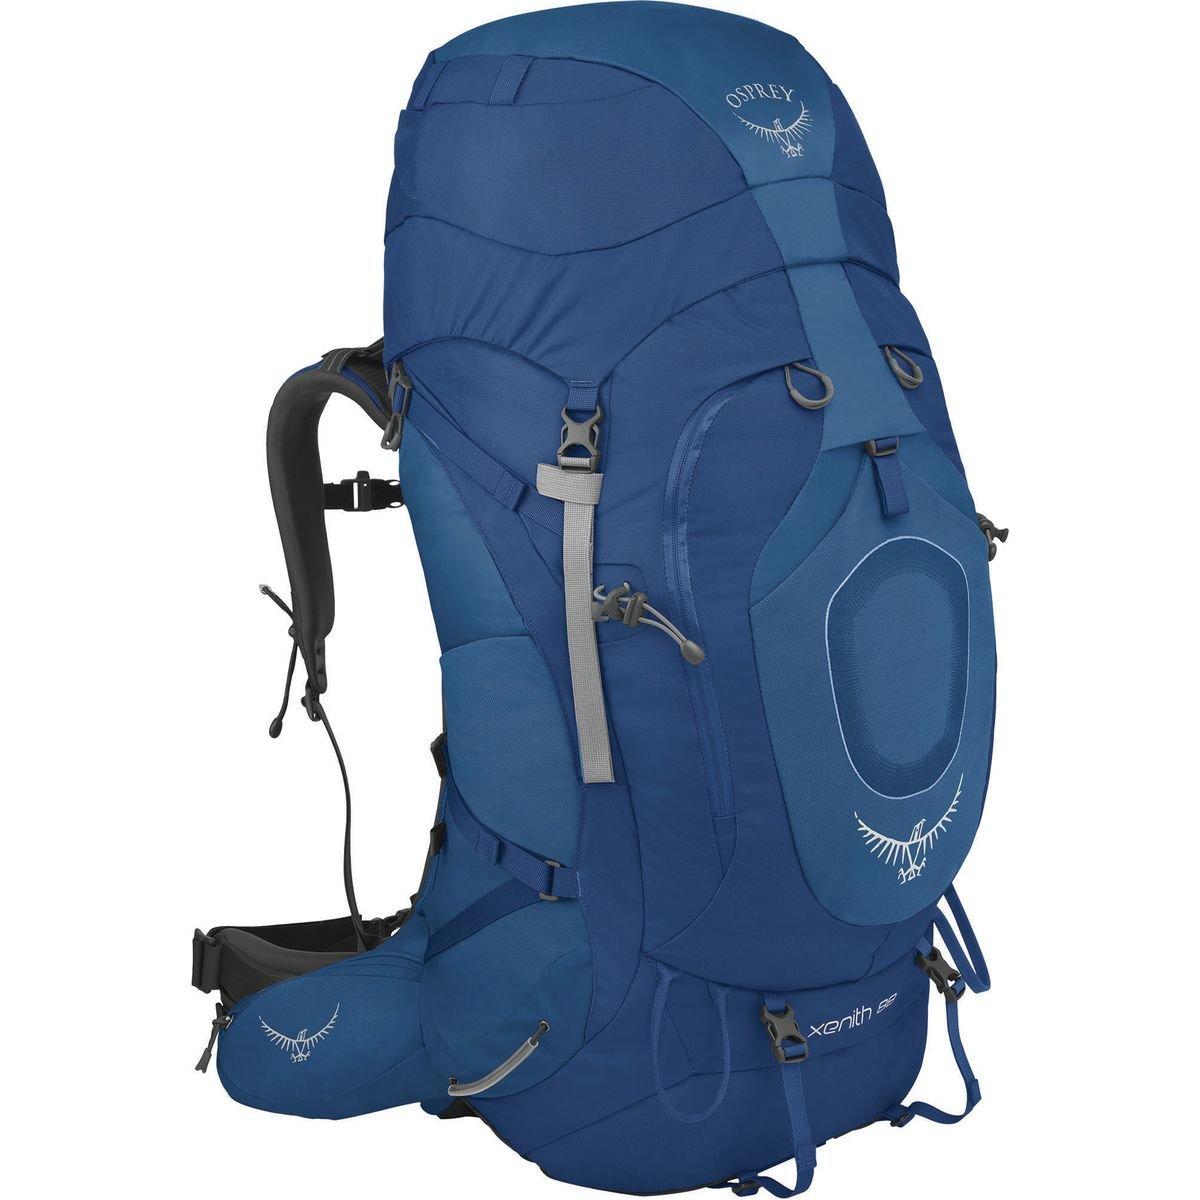 OSPREY(オスプレー) ジーニス88 OS50028 B0787K755K Discovery Blue Large